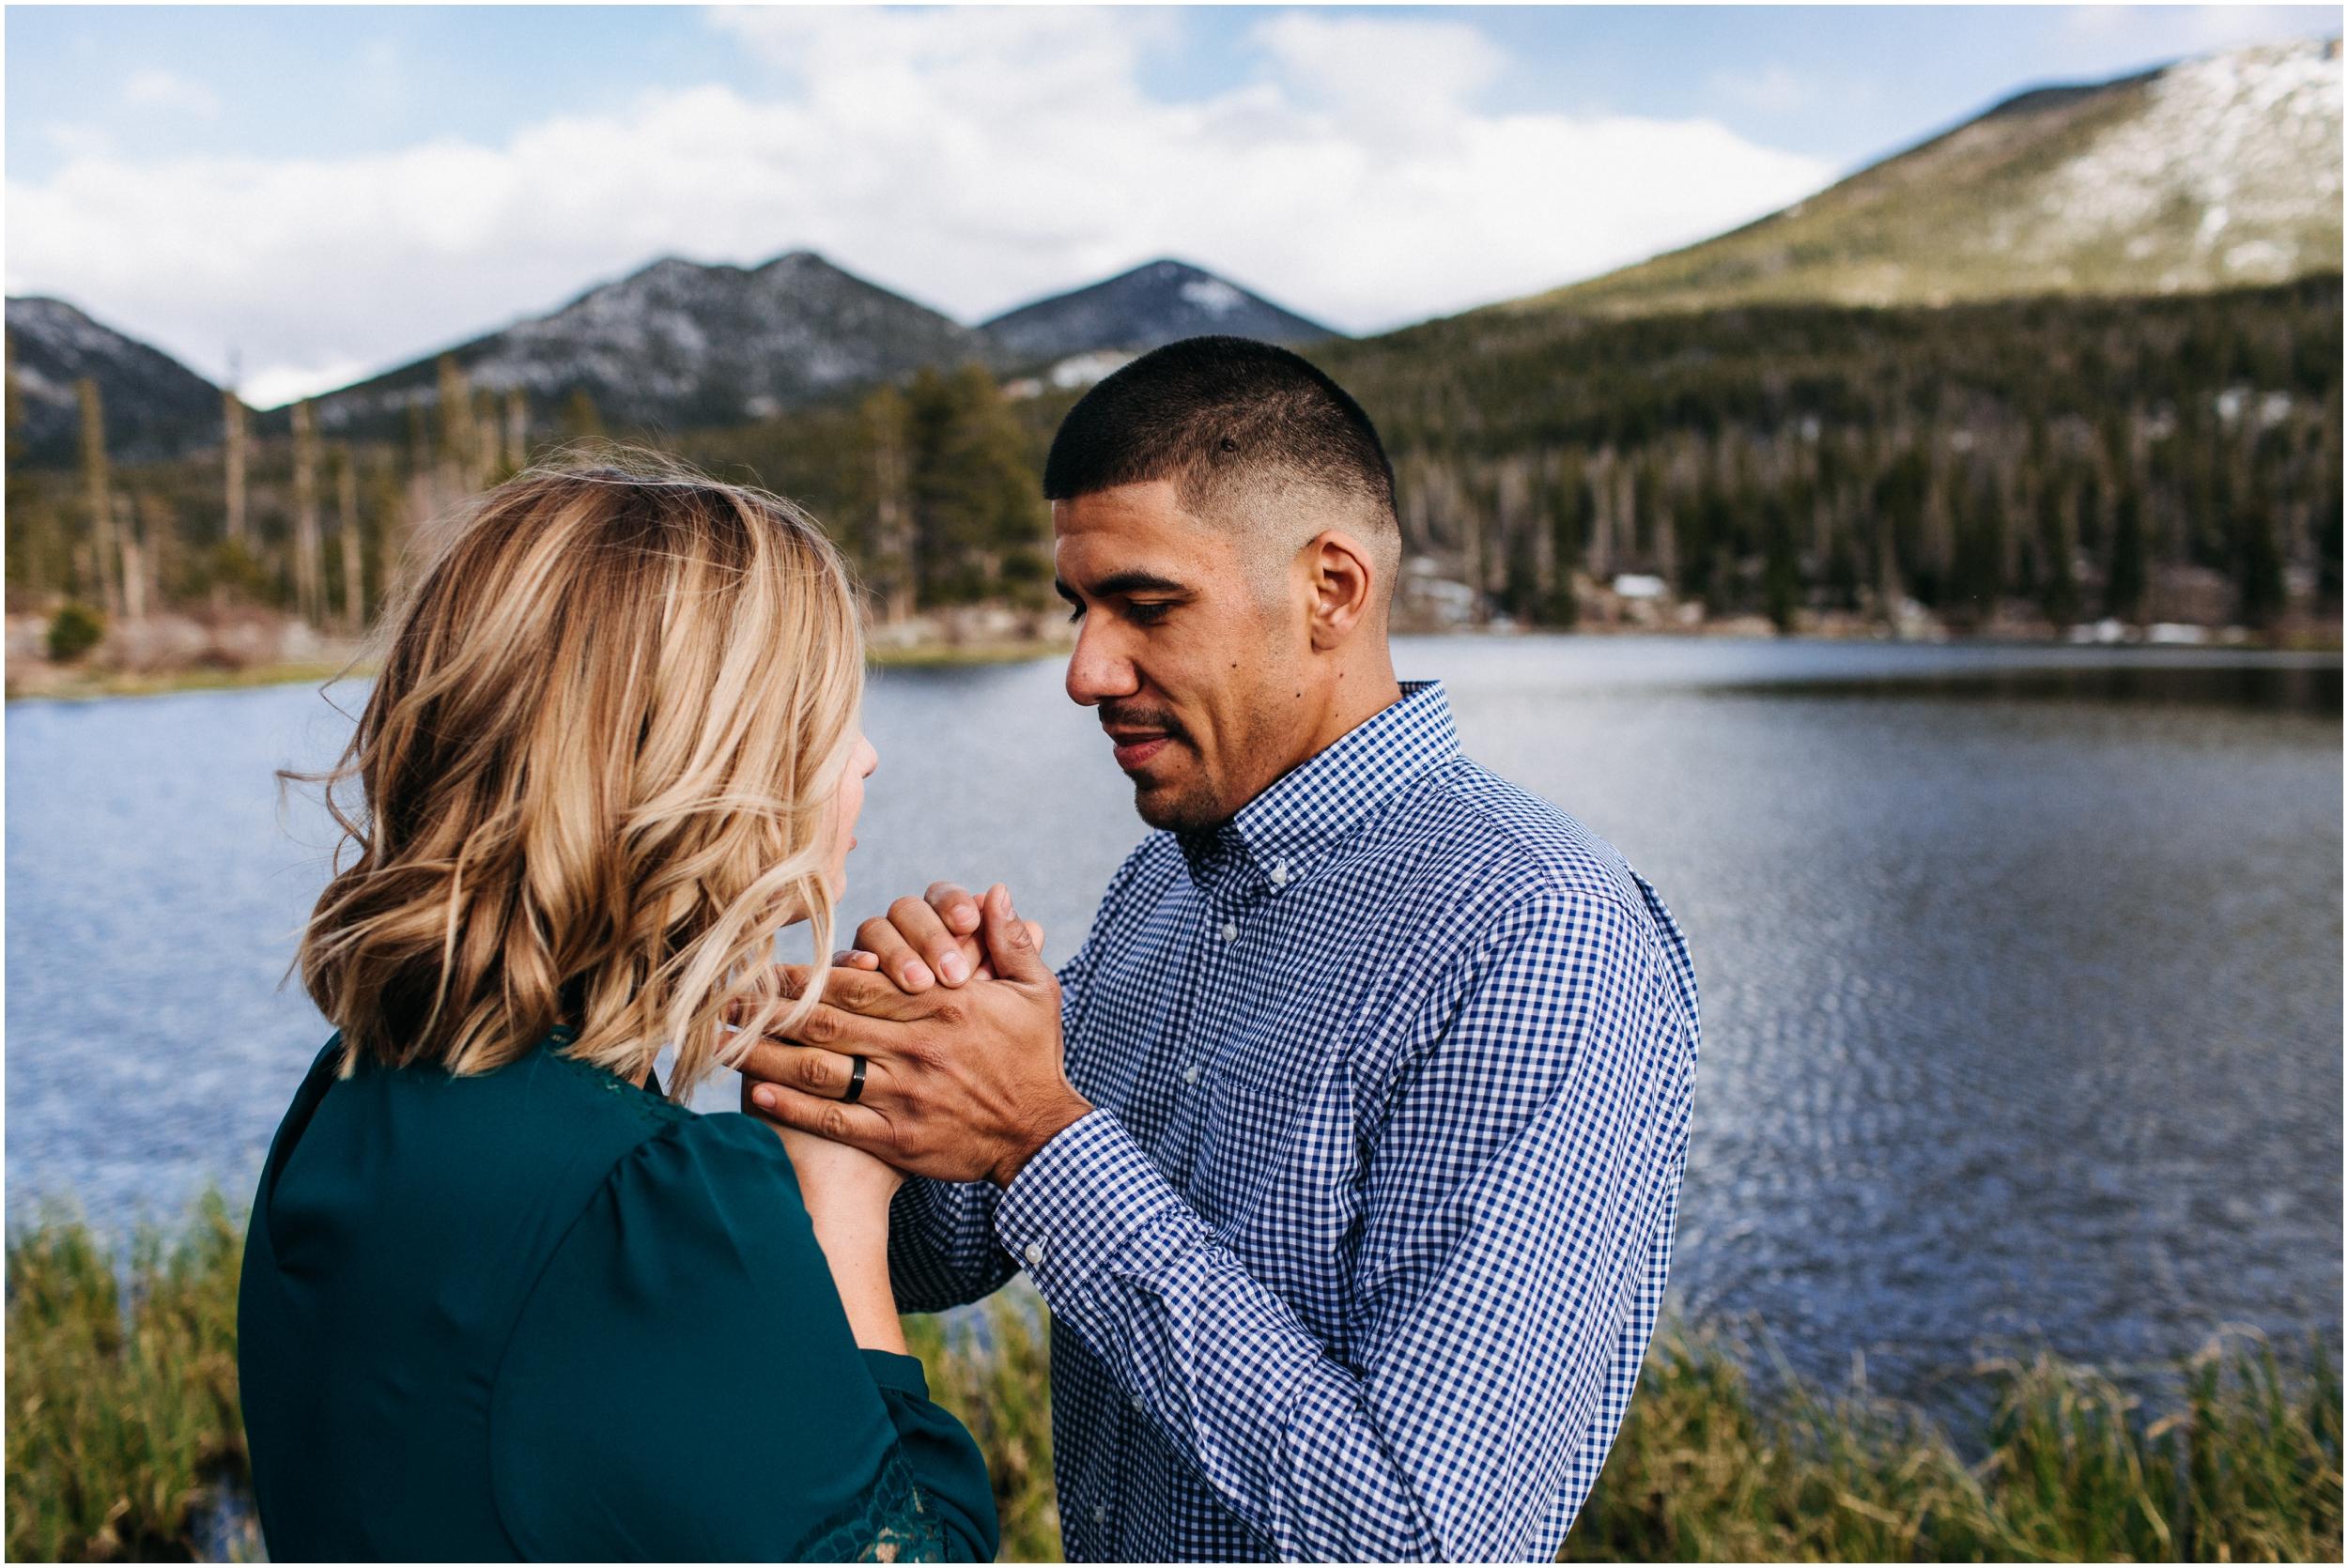 rocky-mountain-national-park-elopement-sprague-lake-colorado-adventure-wedding-photographer_taylor-powers_22.jpg